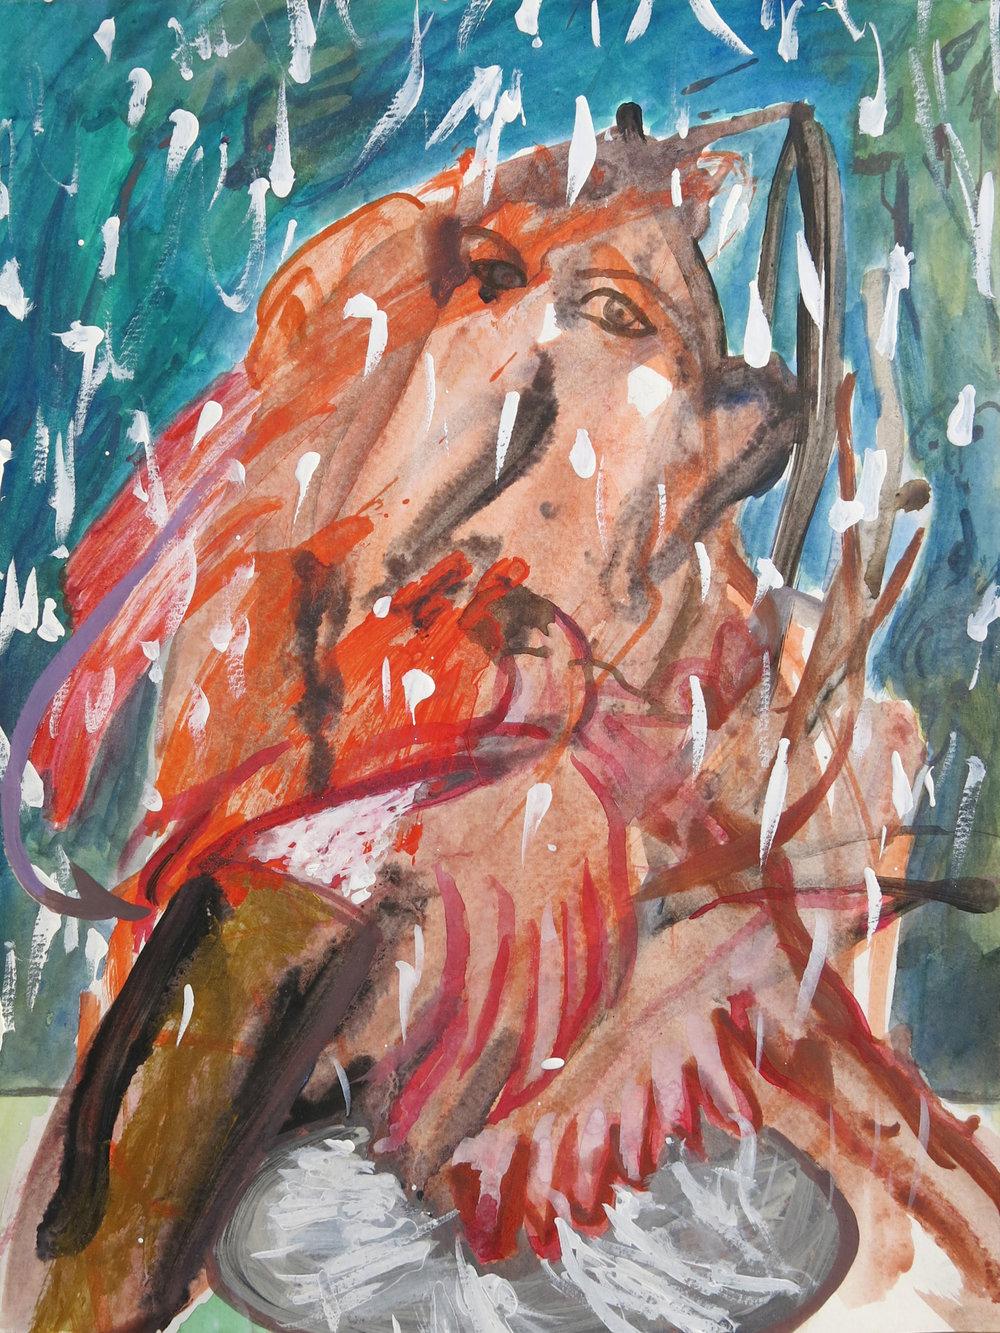 Barbra Streisand Portrait #95